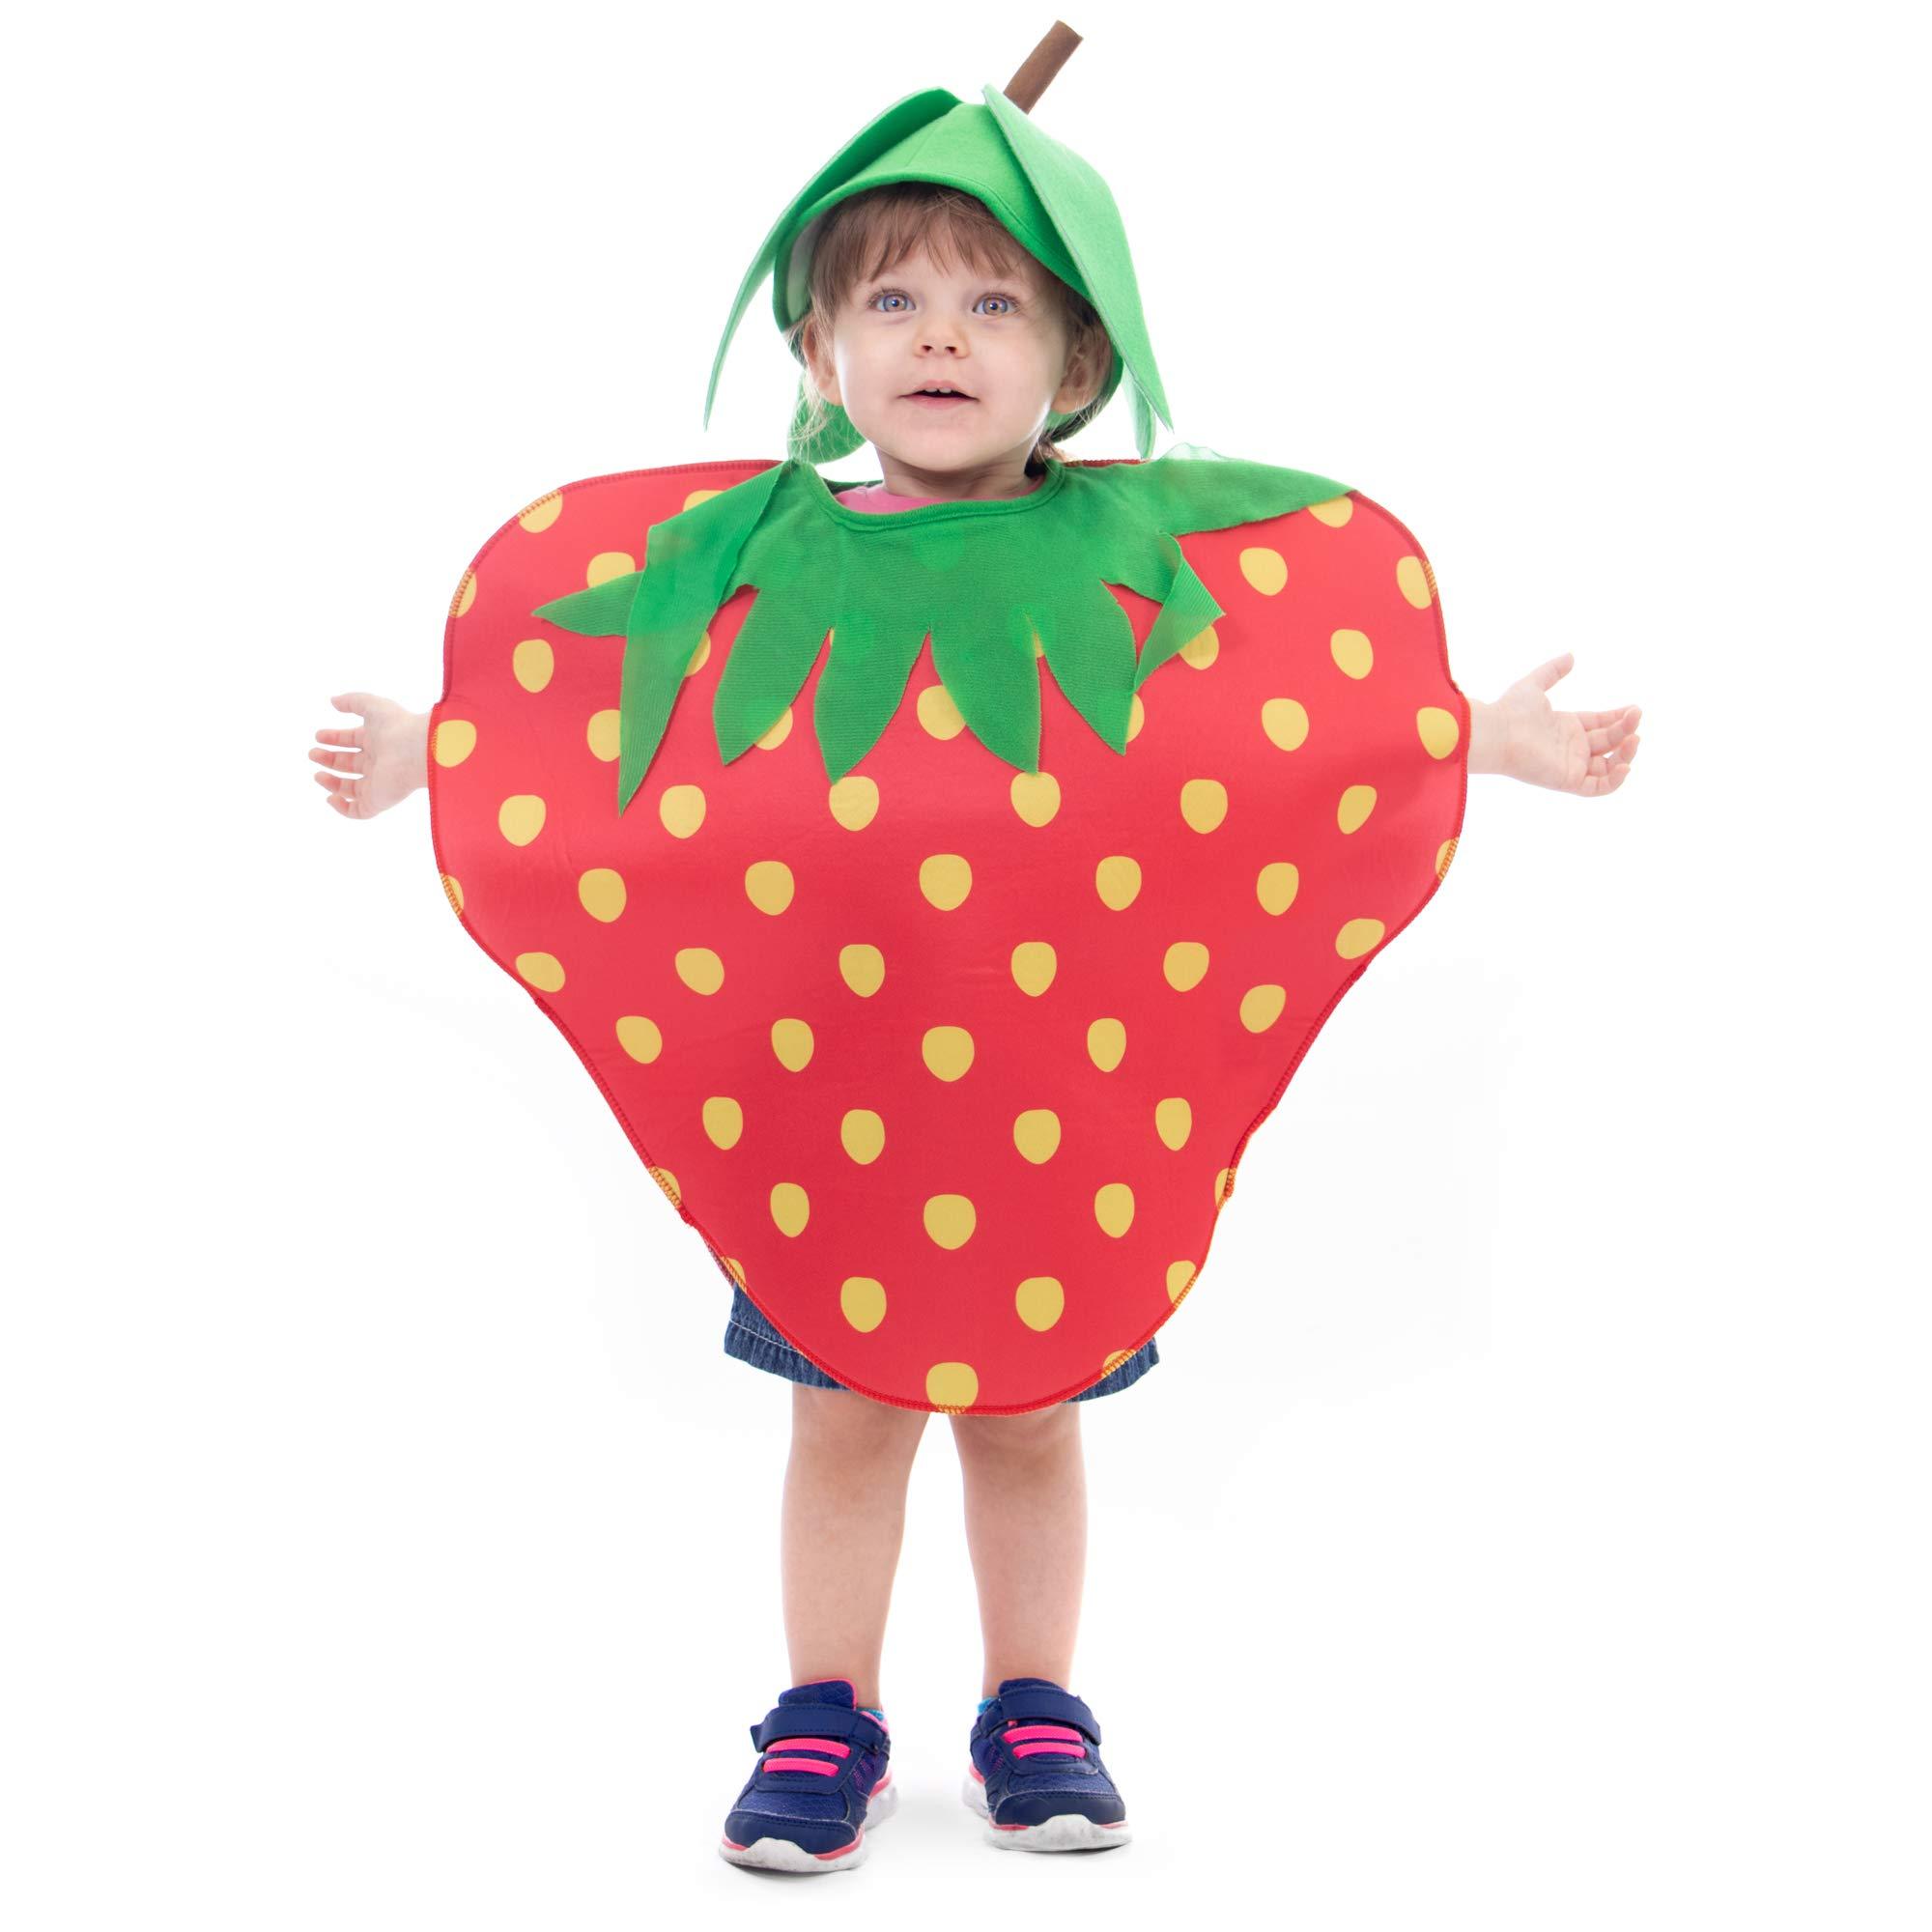 Sweet Strawberry Children's Halloween Costume - Cute Fruit Suit & Hat (Small) by Hauntlook